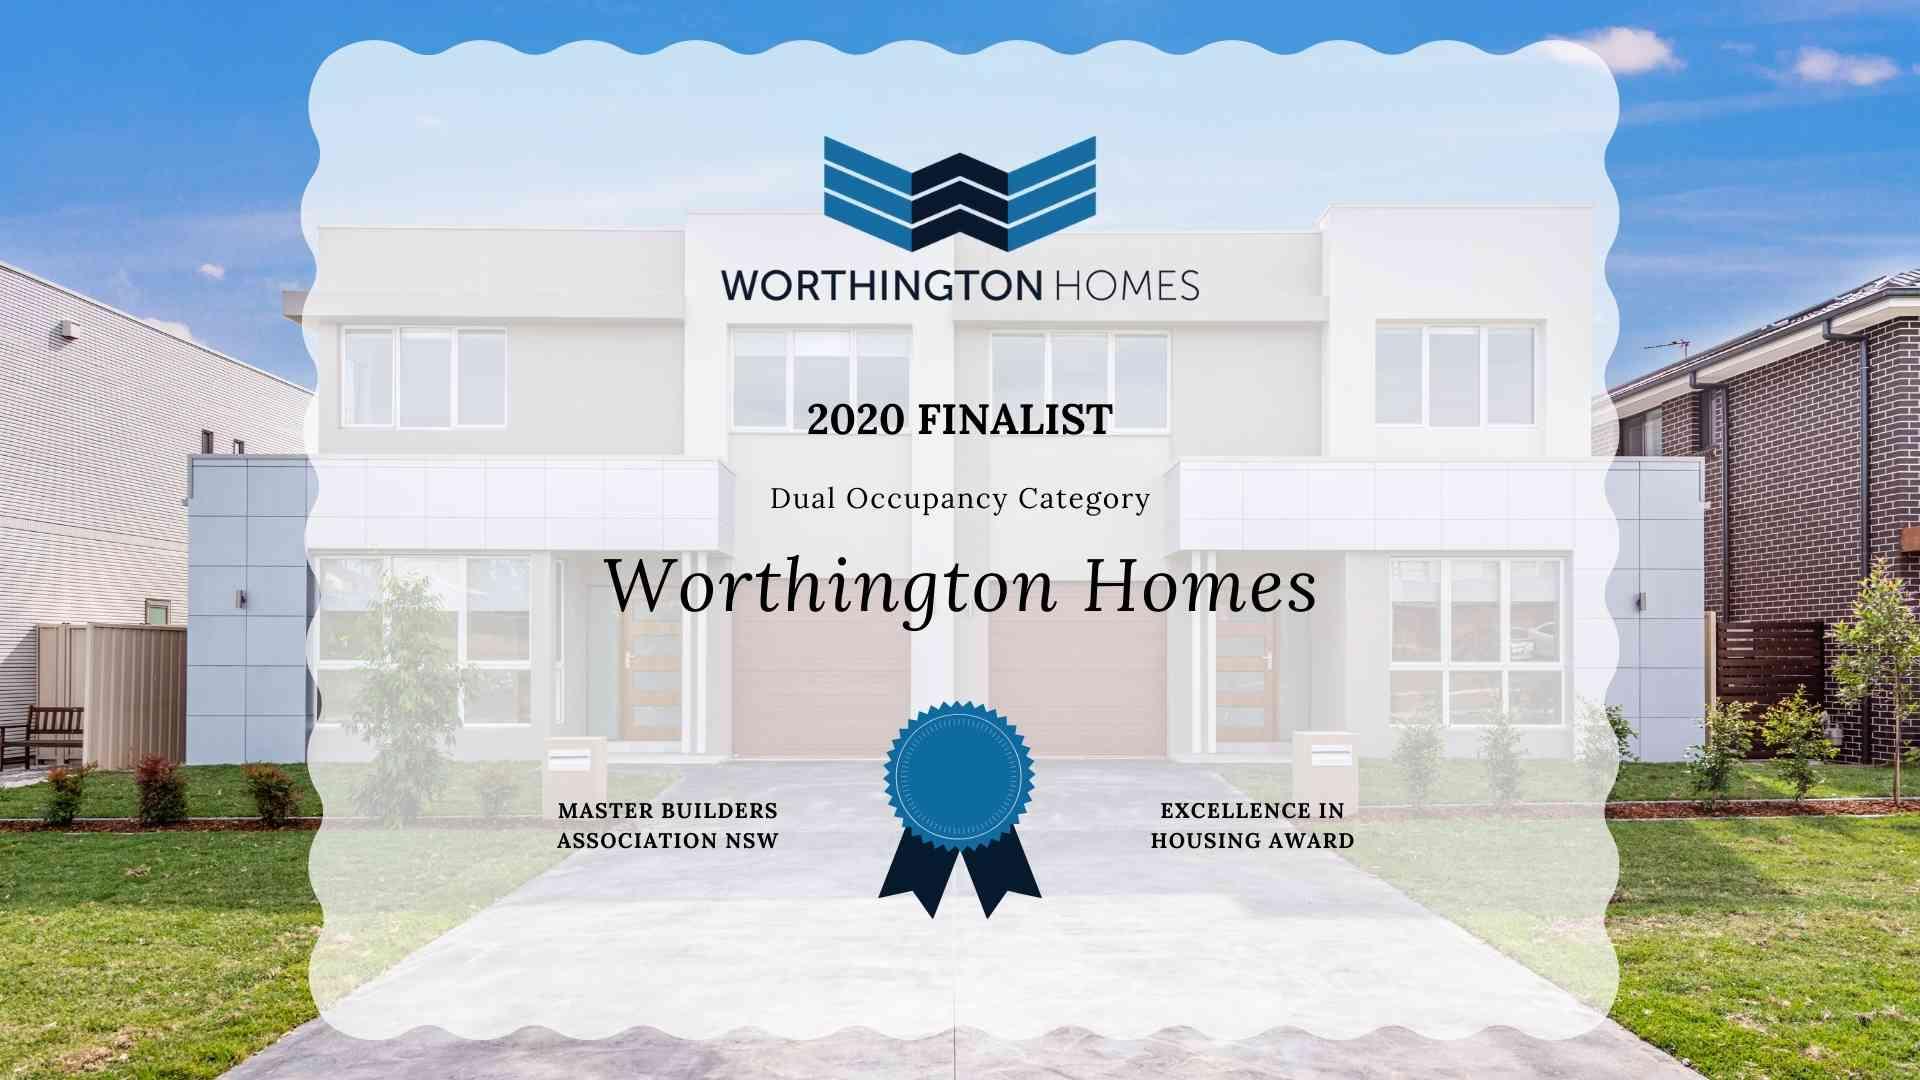 Master Builders Association NSW | Worthington Homes